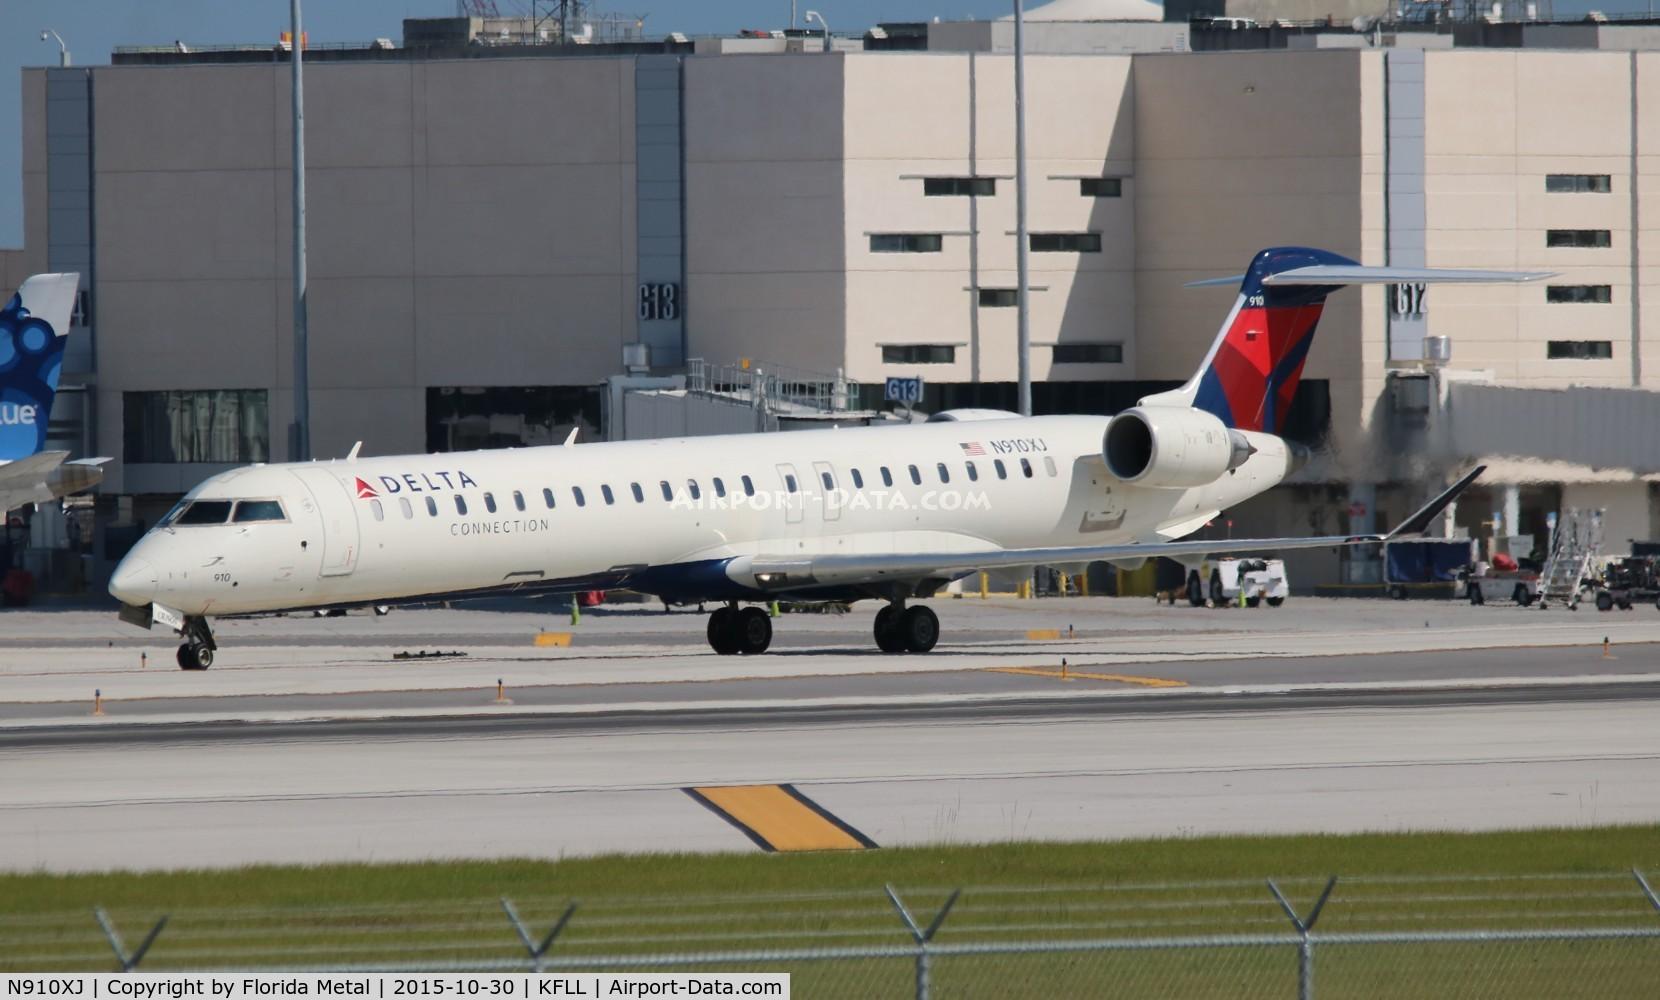 N910XJ, 2007 Bombardier CRJ-900ER (CL-600-2D24) C/N 15143, FLL spotting